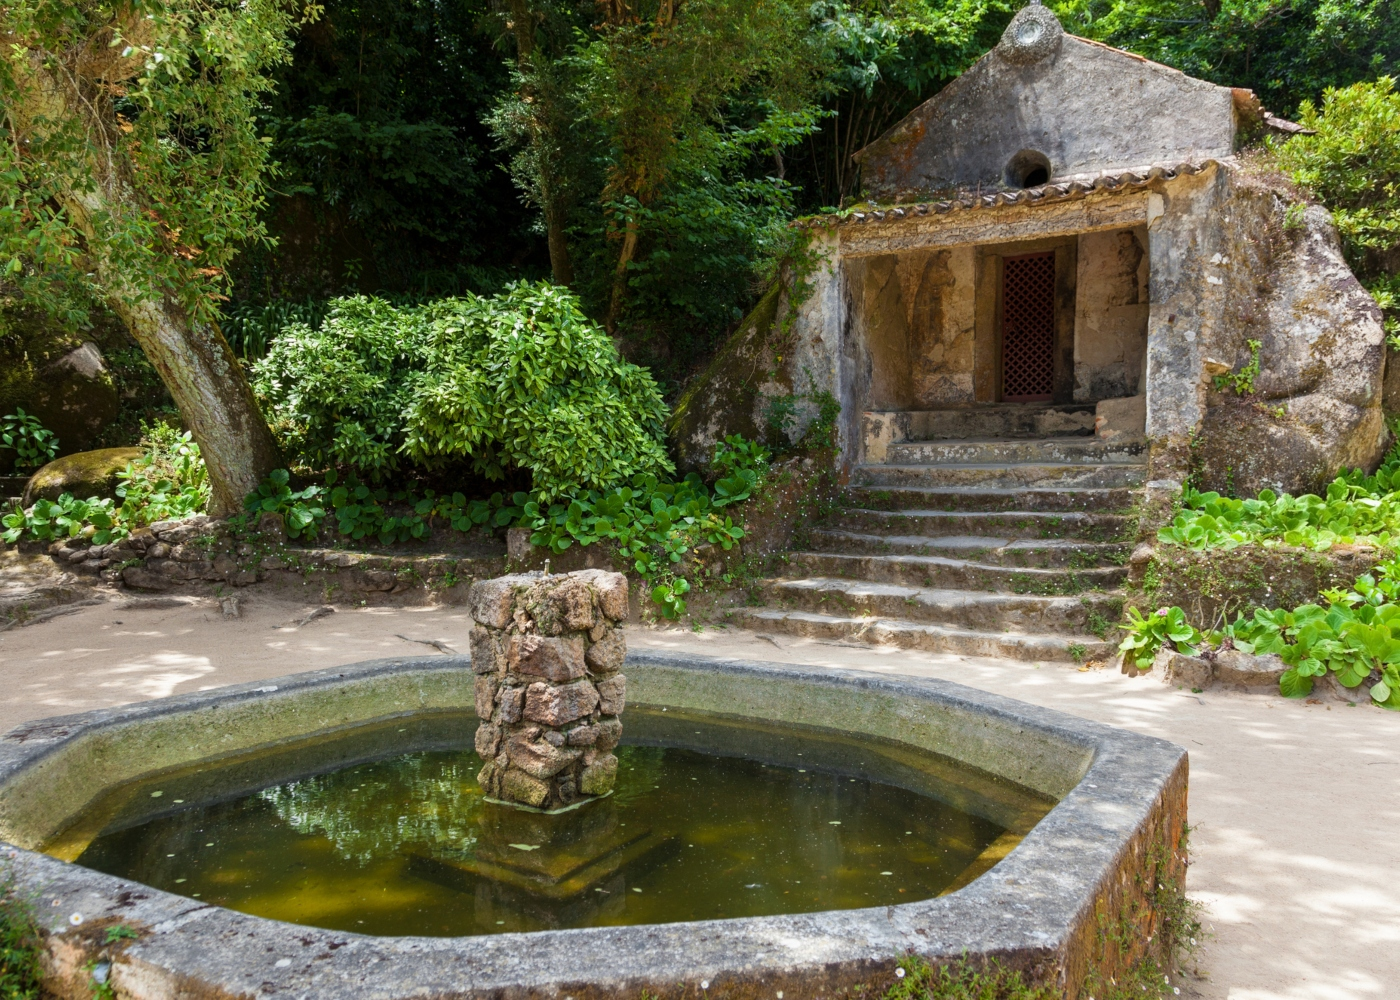 Claustro do Convento dos Capuchos